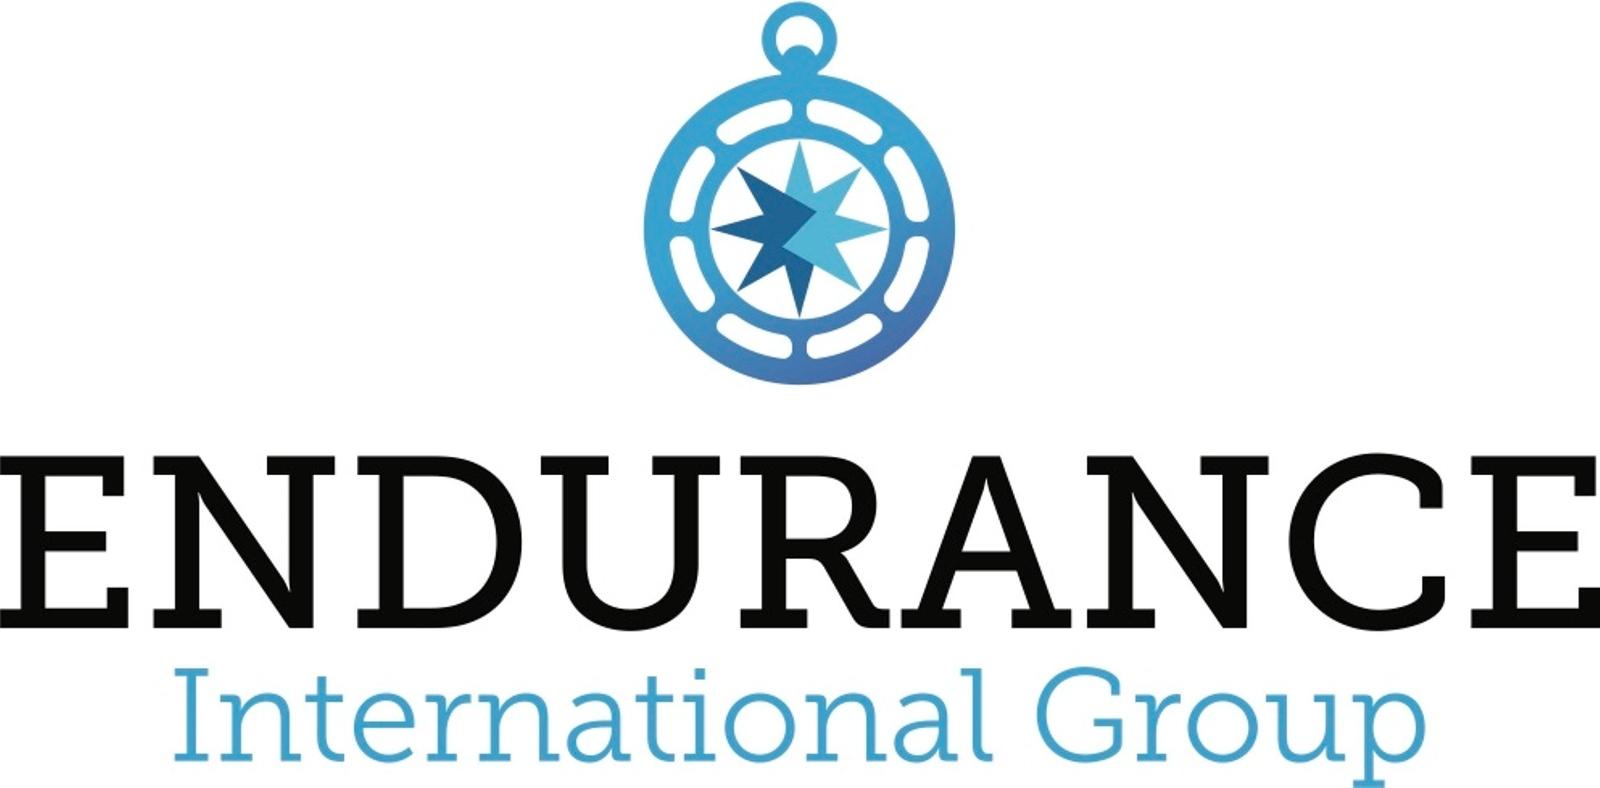 endurance international group mumbai